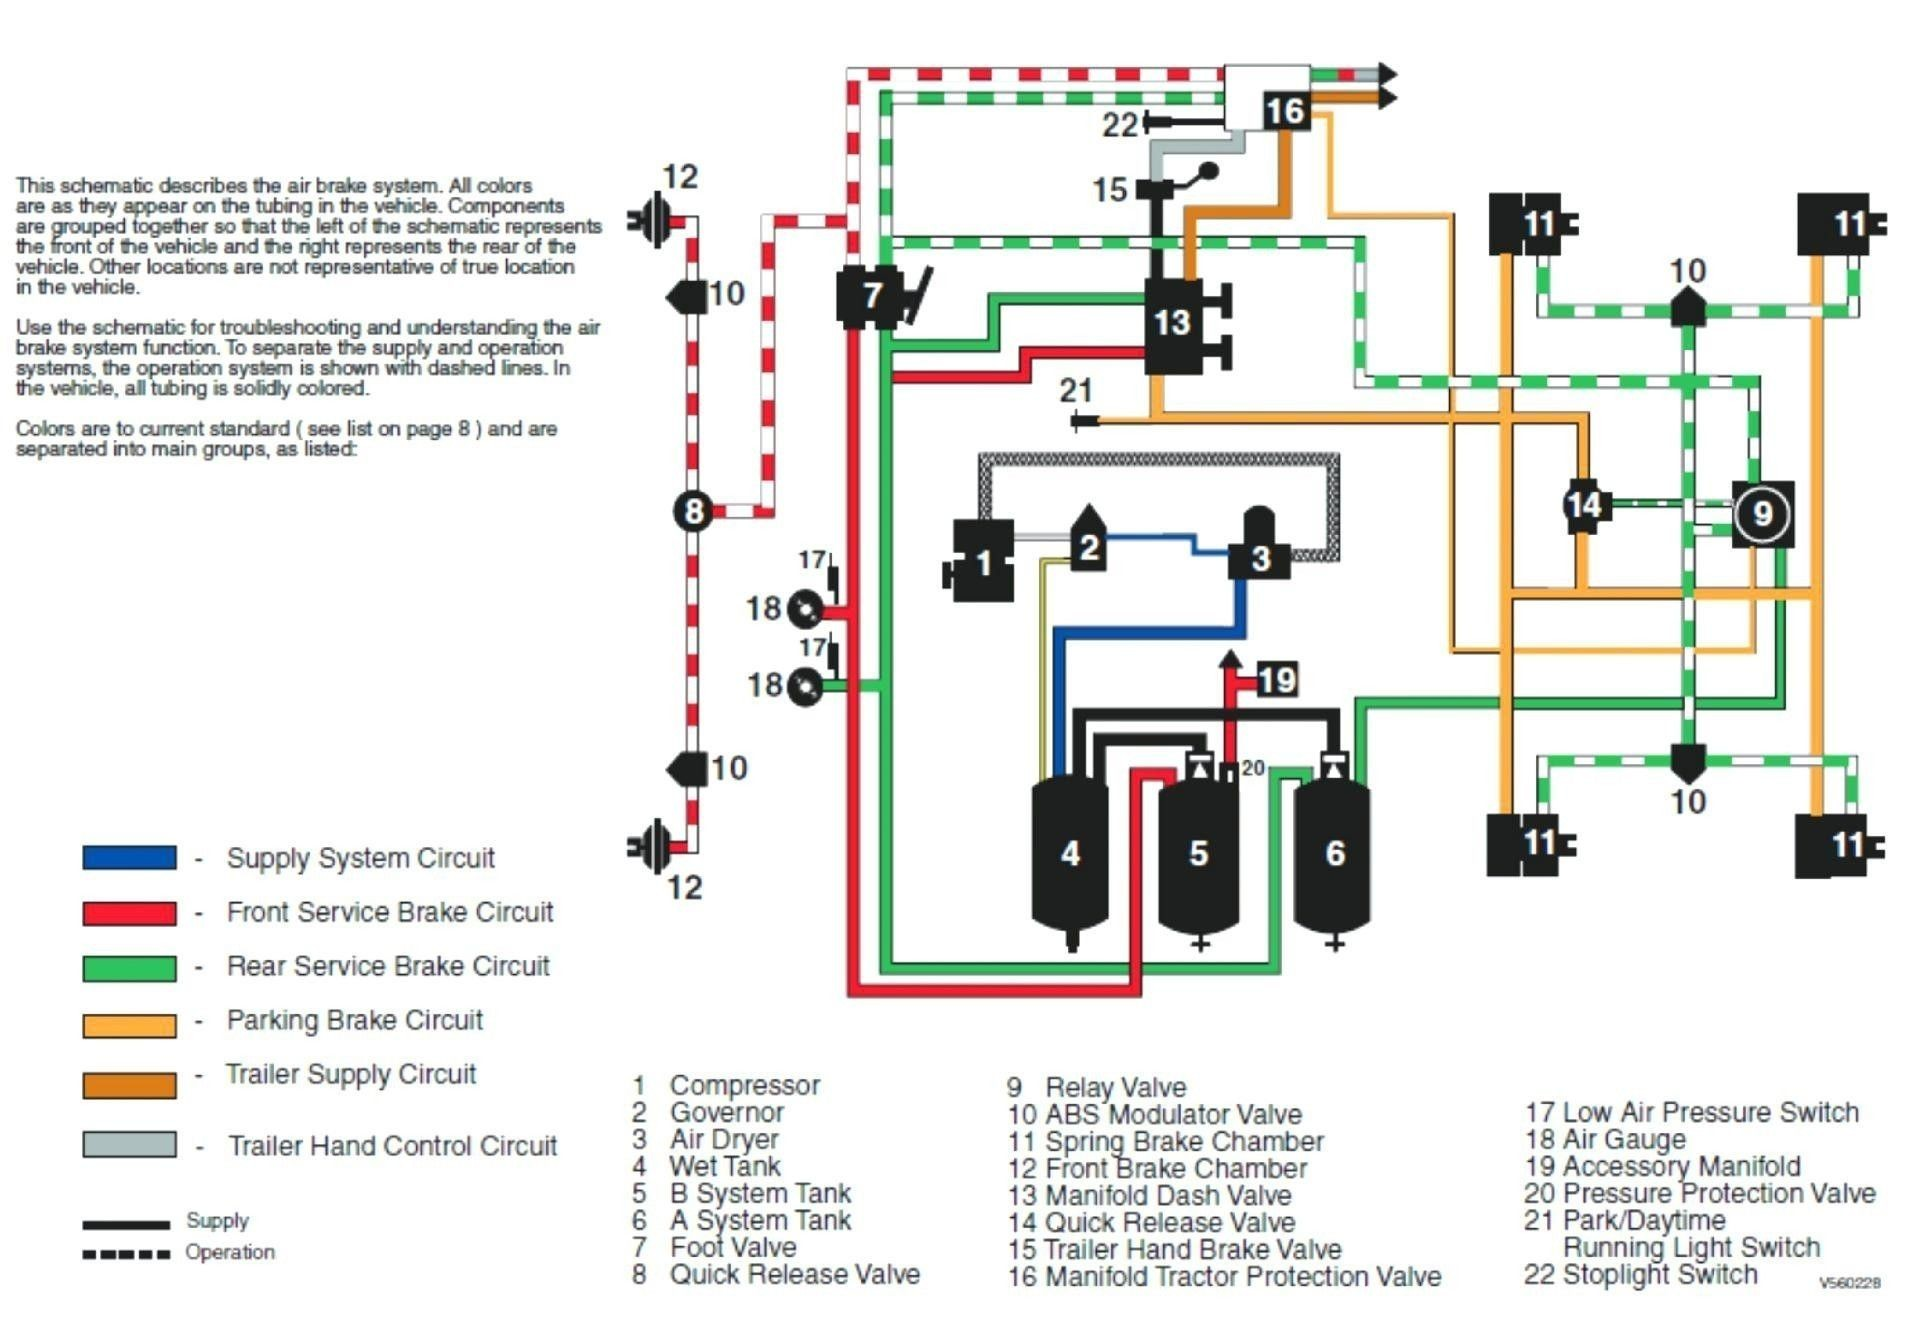 Car Stereo Amp Installation Diagram Car Brake Wiring Diagram Of Car Stereo Amp Installation Diagram